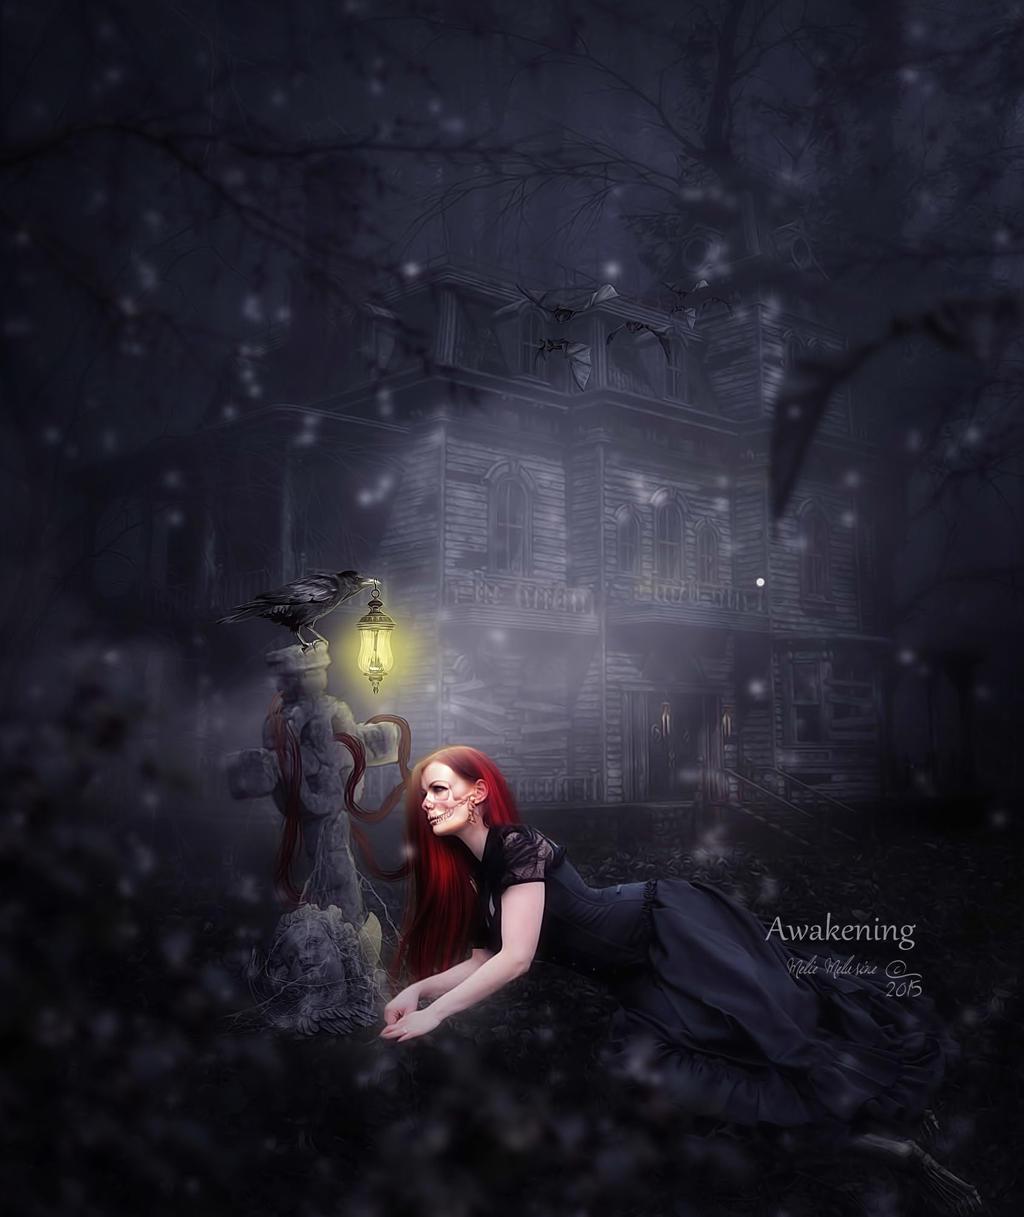 Awakening by MelieMelusine